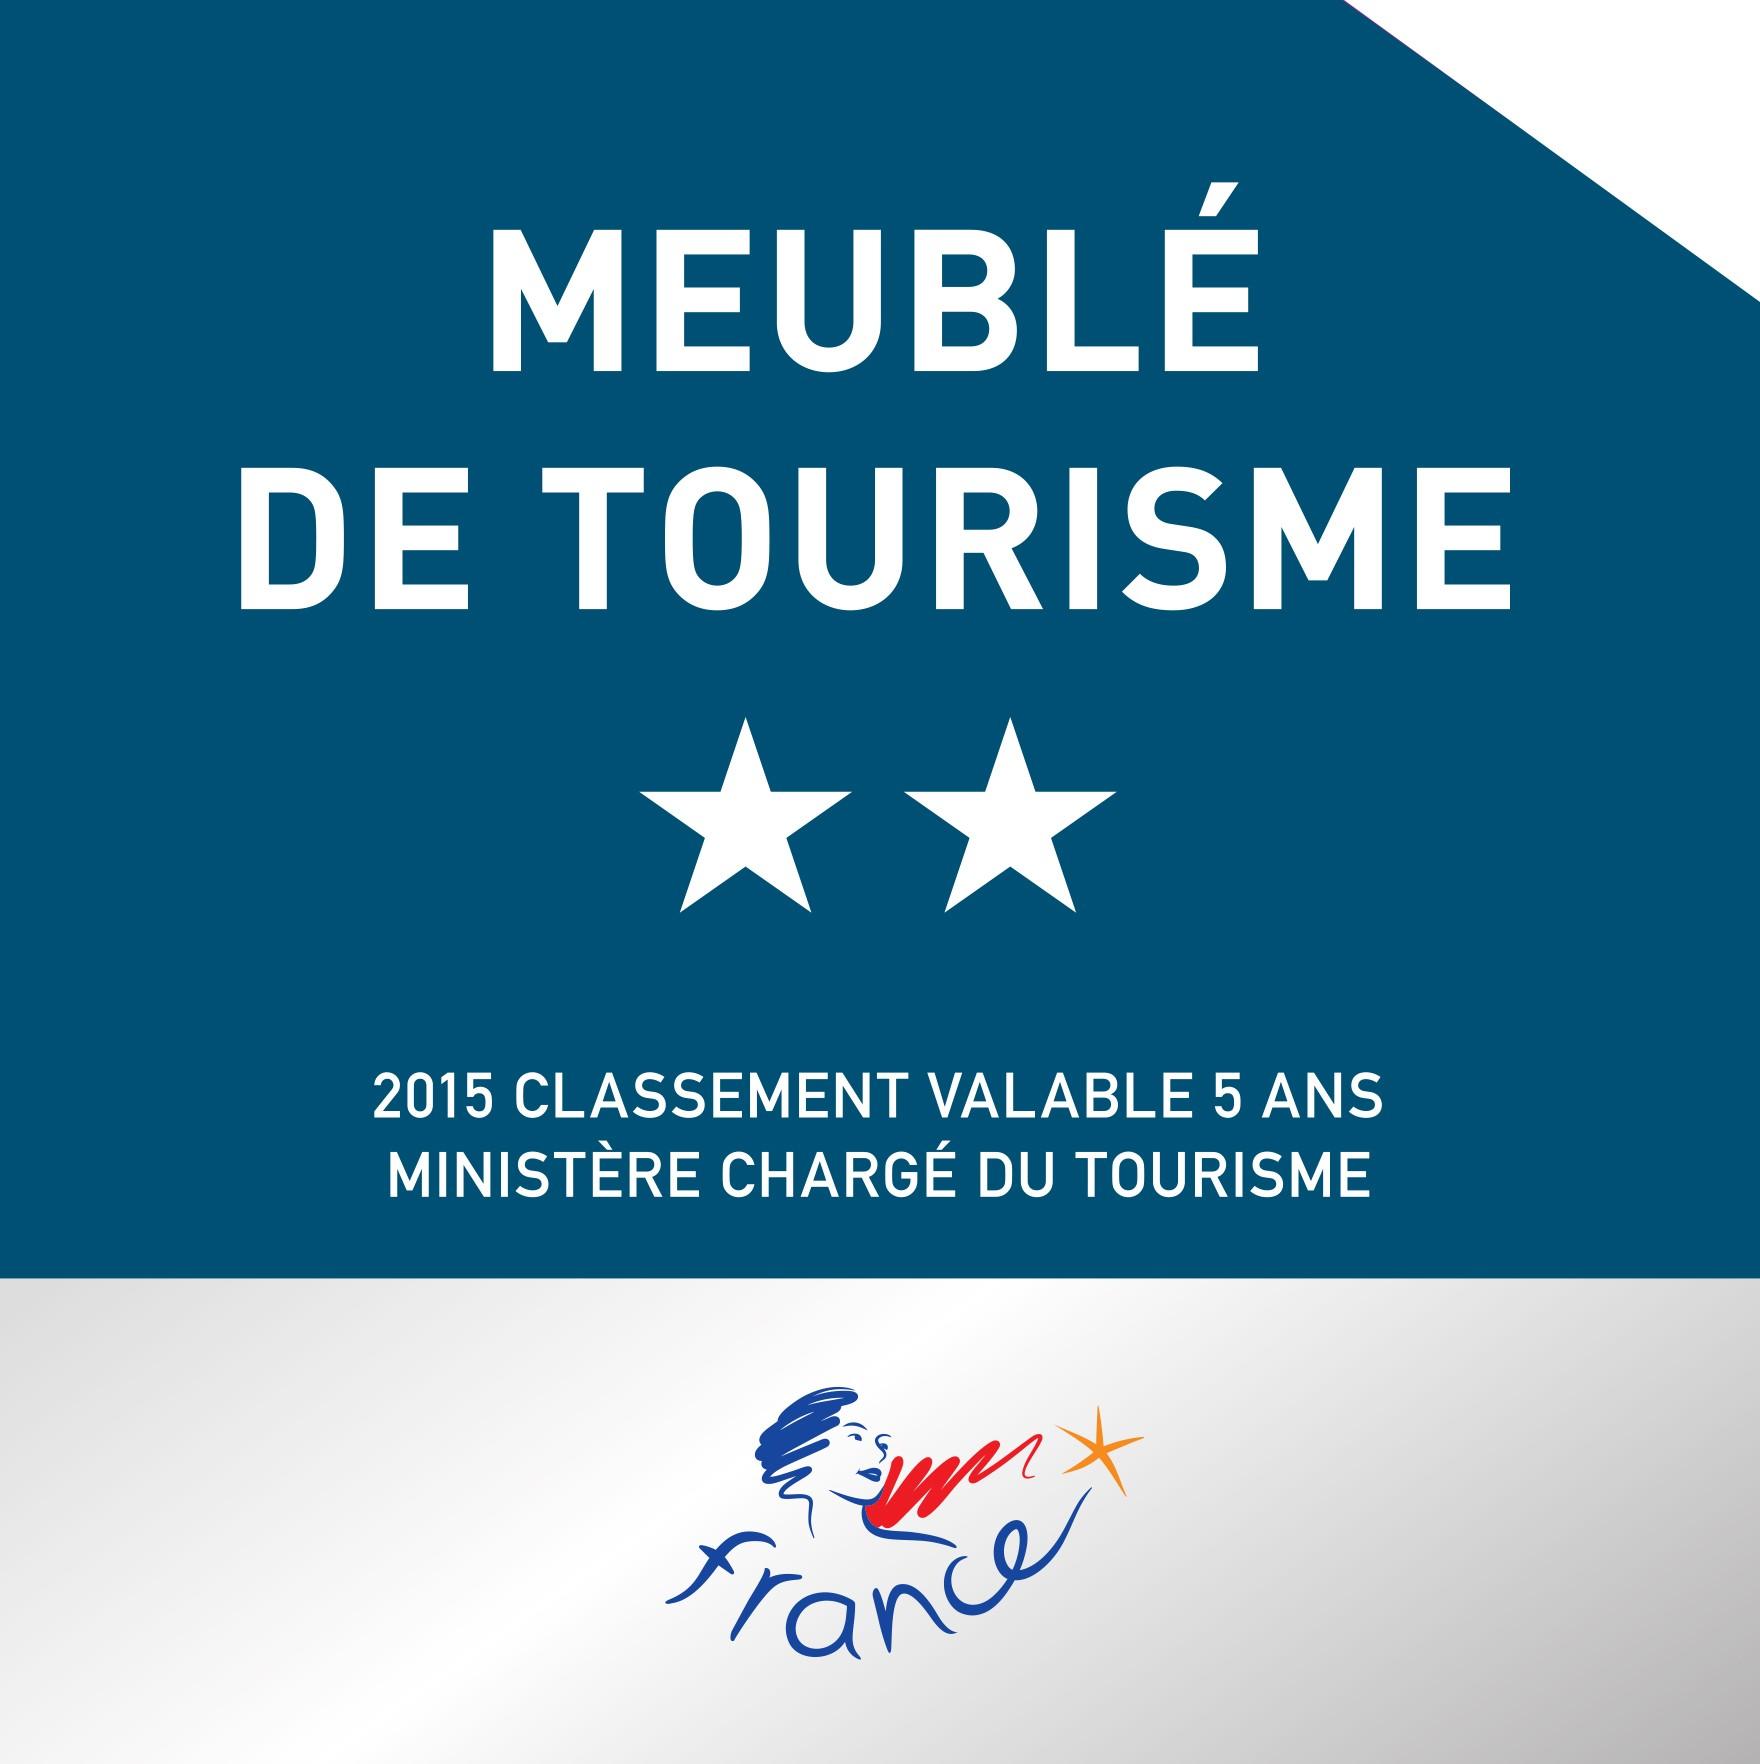 plaque-meuble-tourisme2-2015-11615